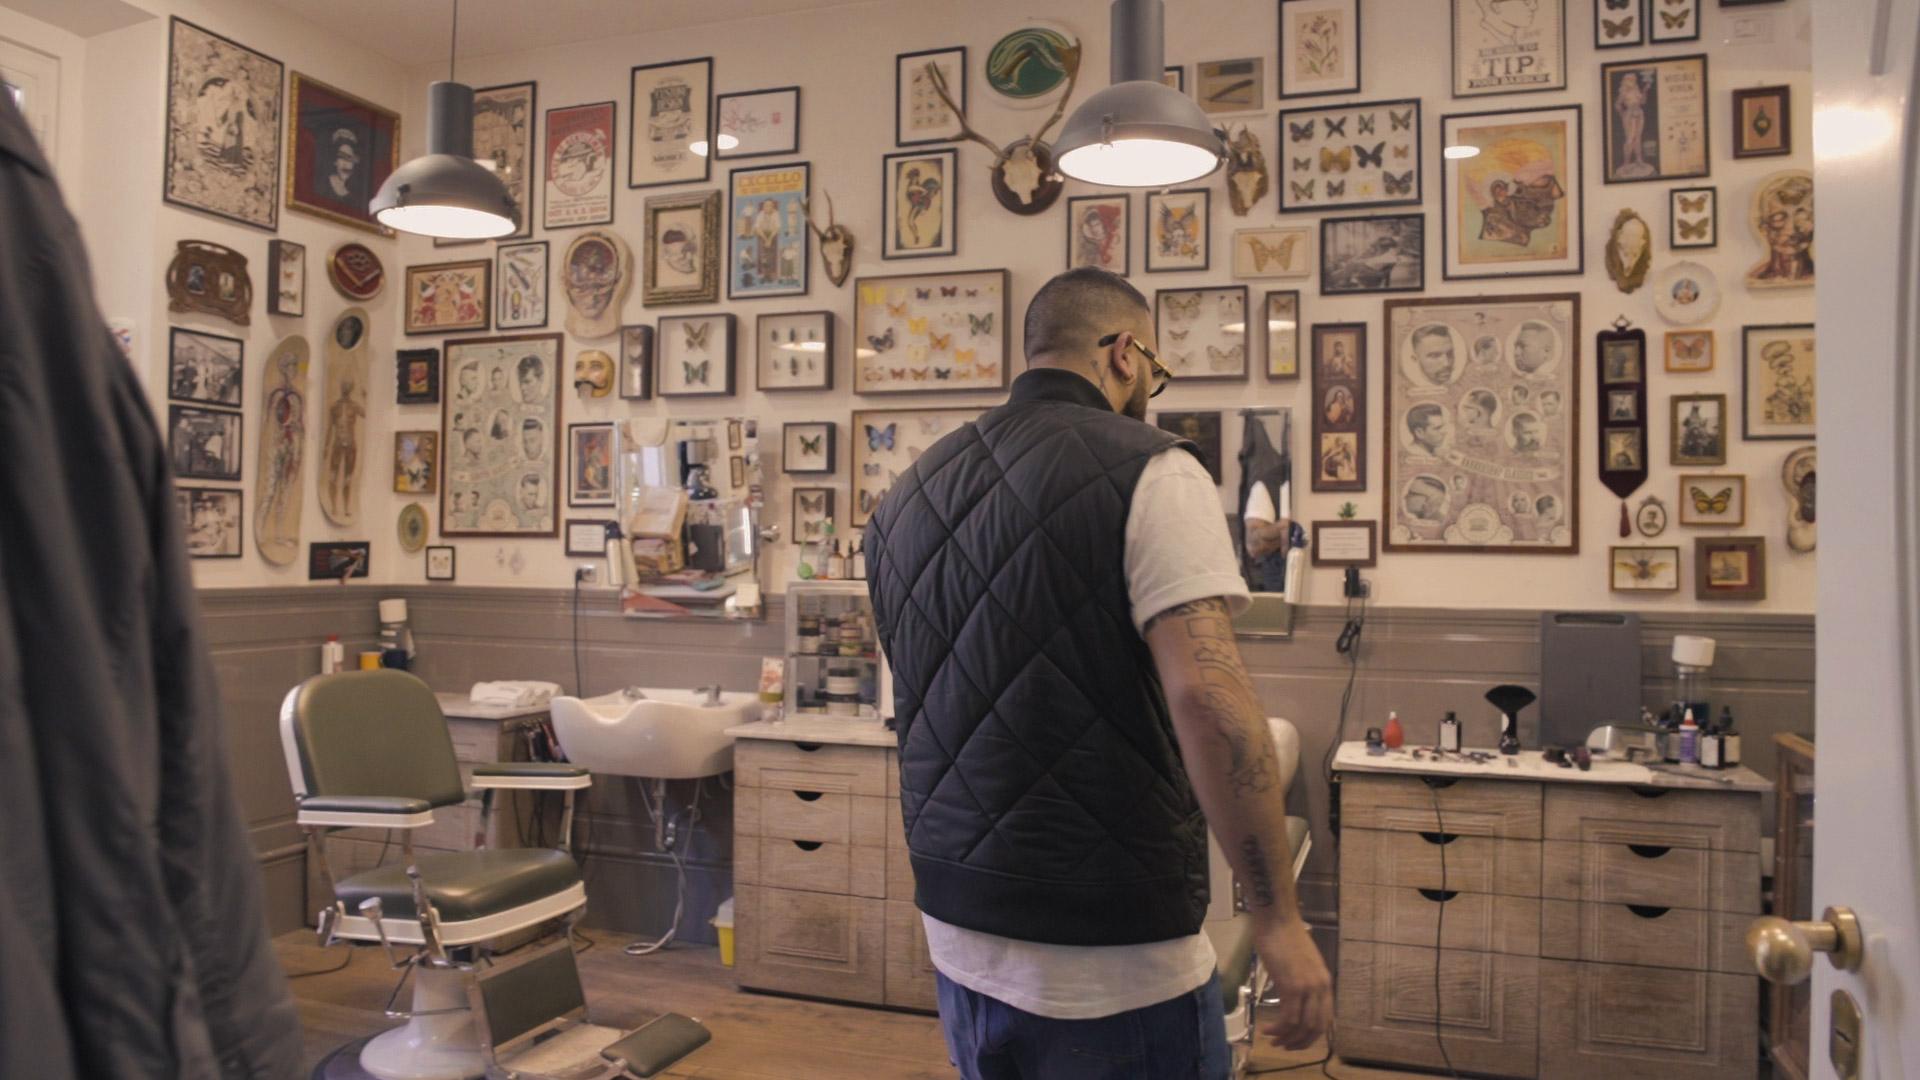 Barber's Chairs - Bullfrog Barbershop - Nicola Crocco 01